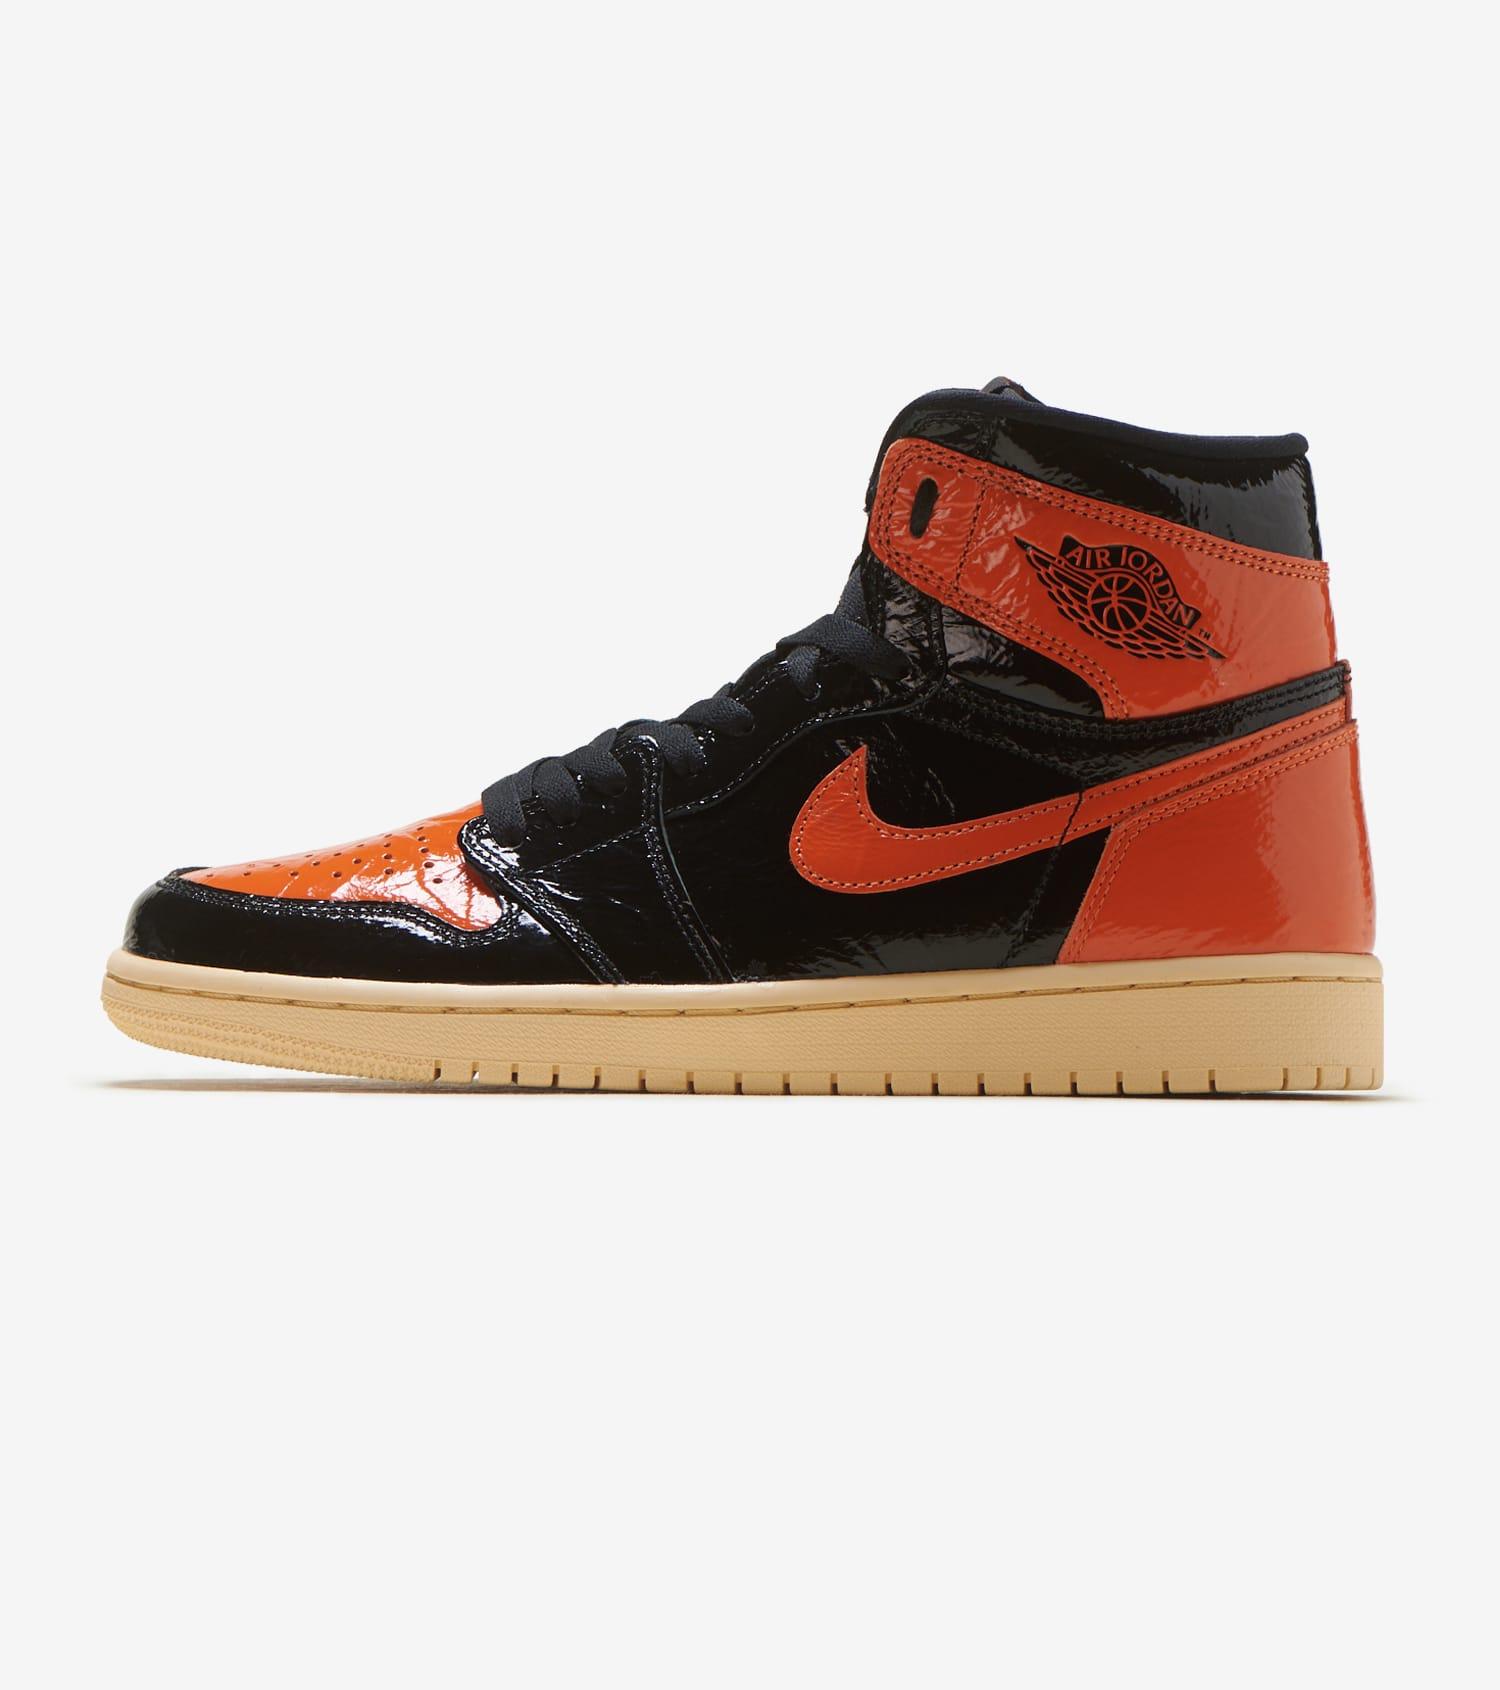 many fashionable sneakers a few days away Air Jordan 1 Retro High OG